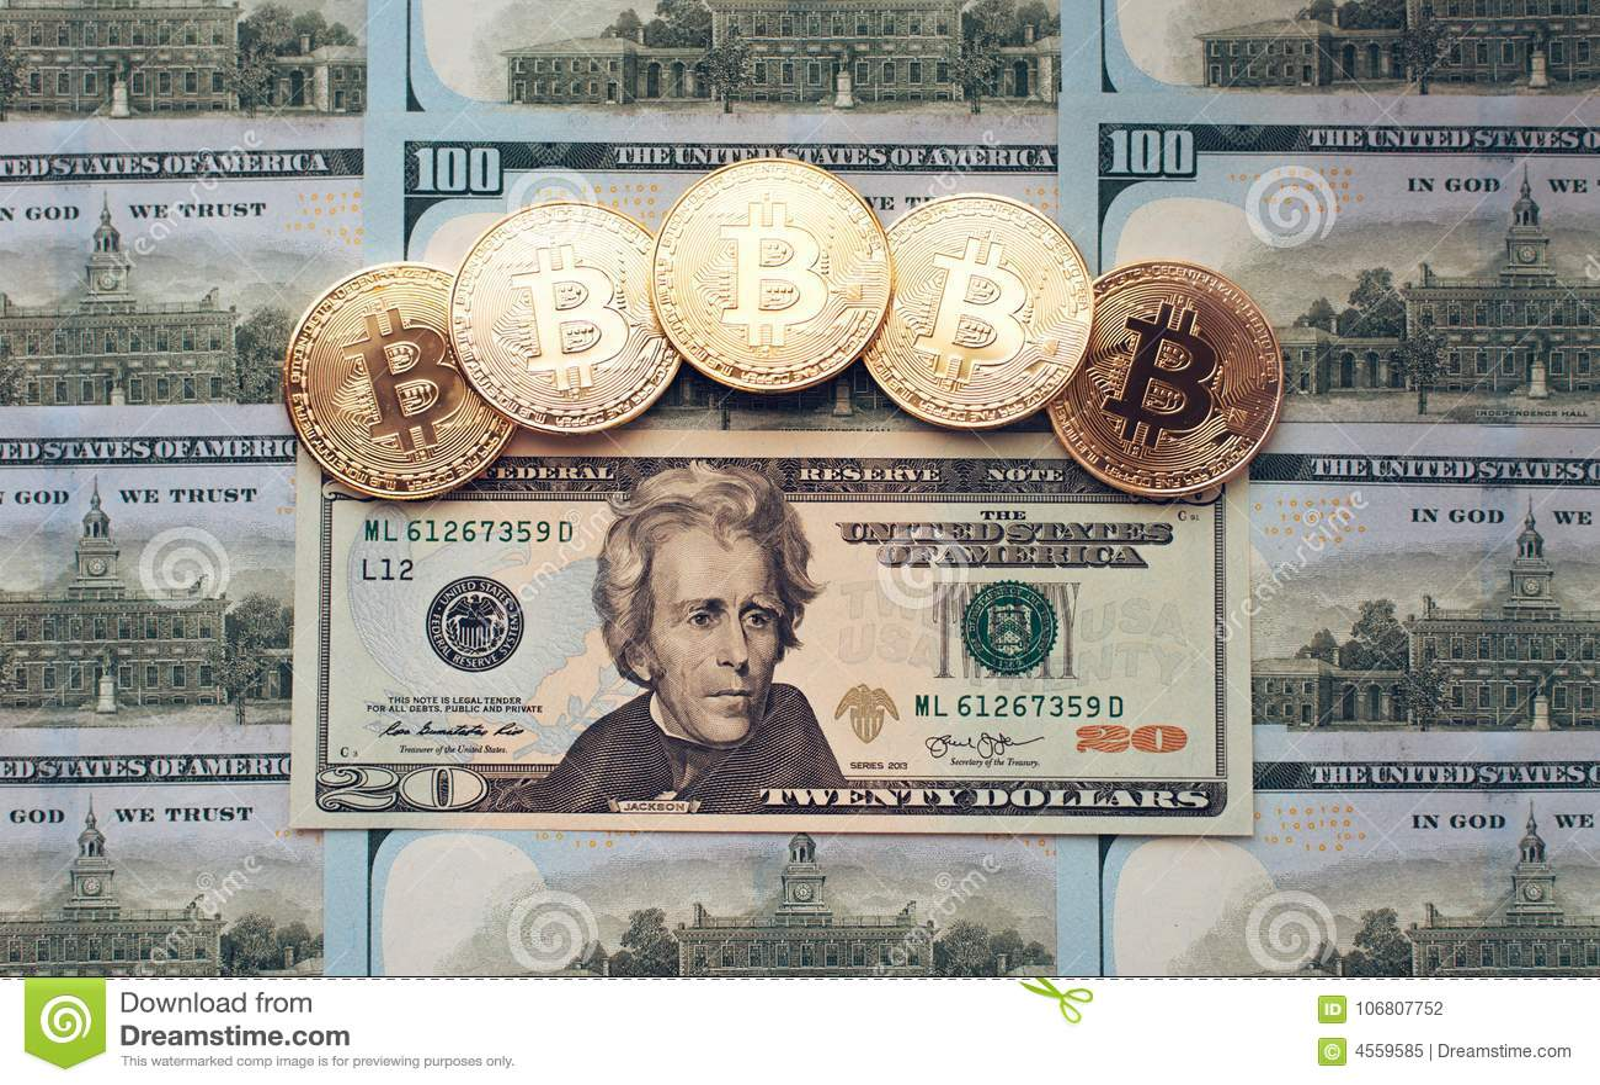 buy 20 dollars of bitcoin